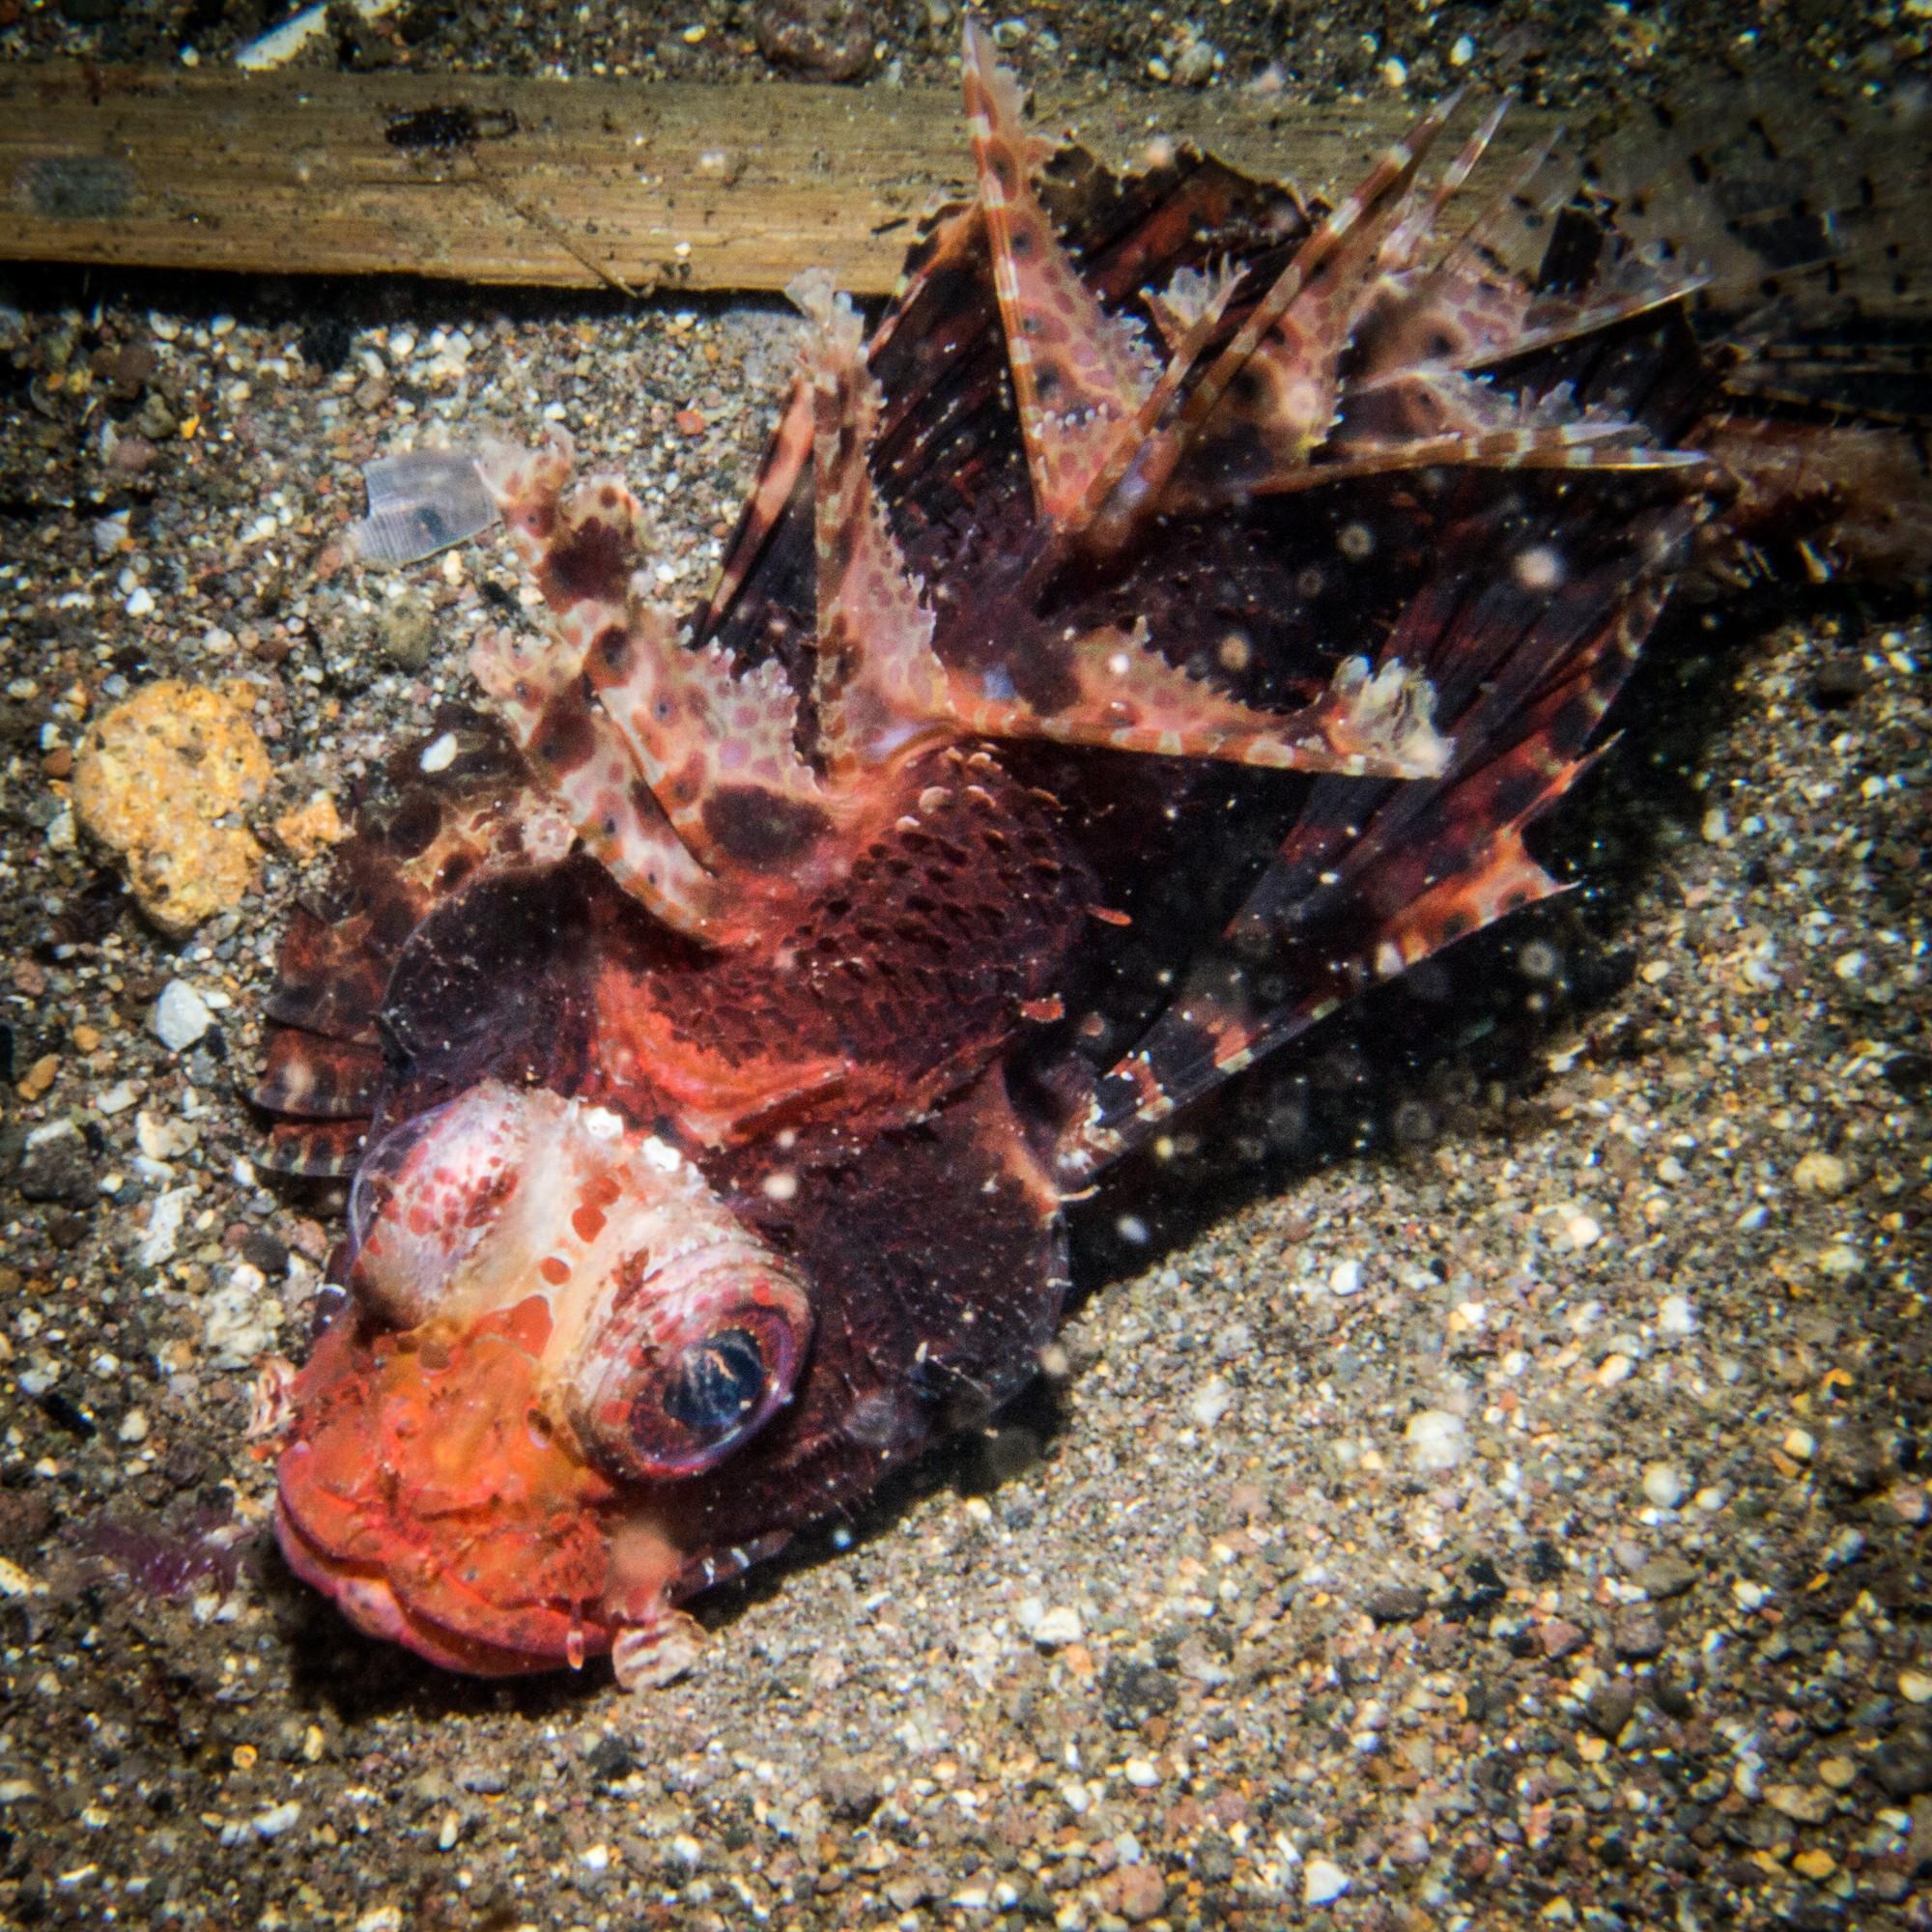 Waiterang wreck dive site Maumere